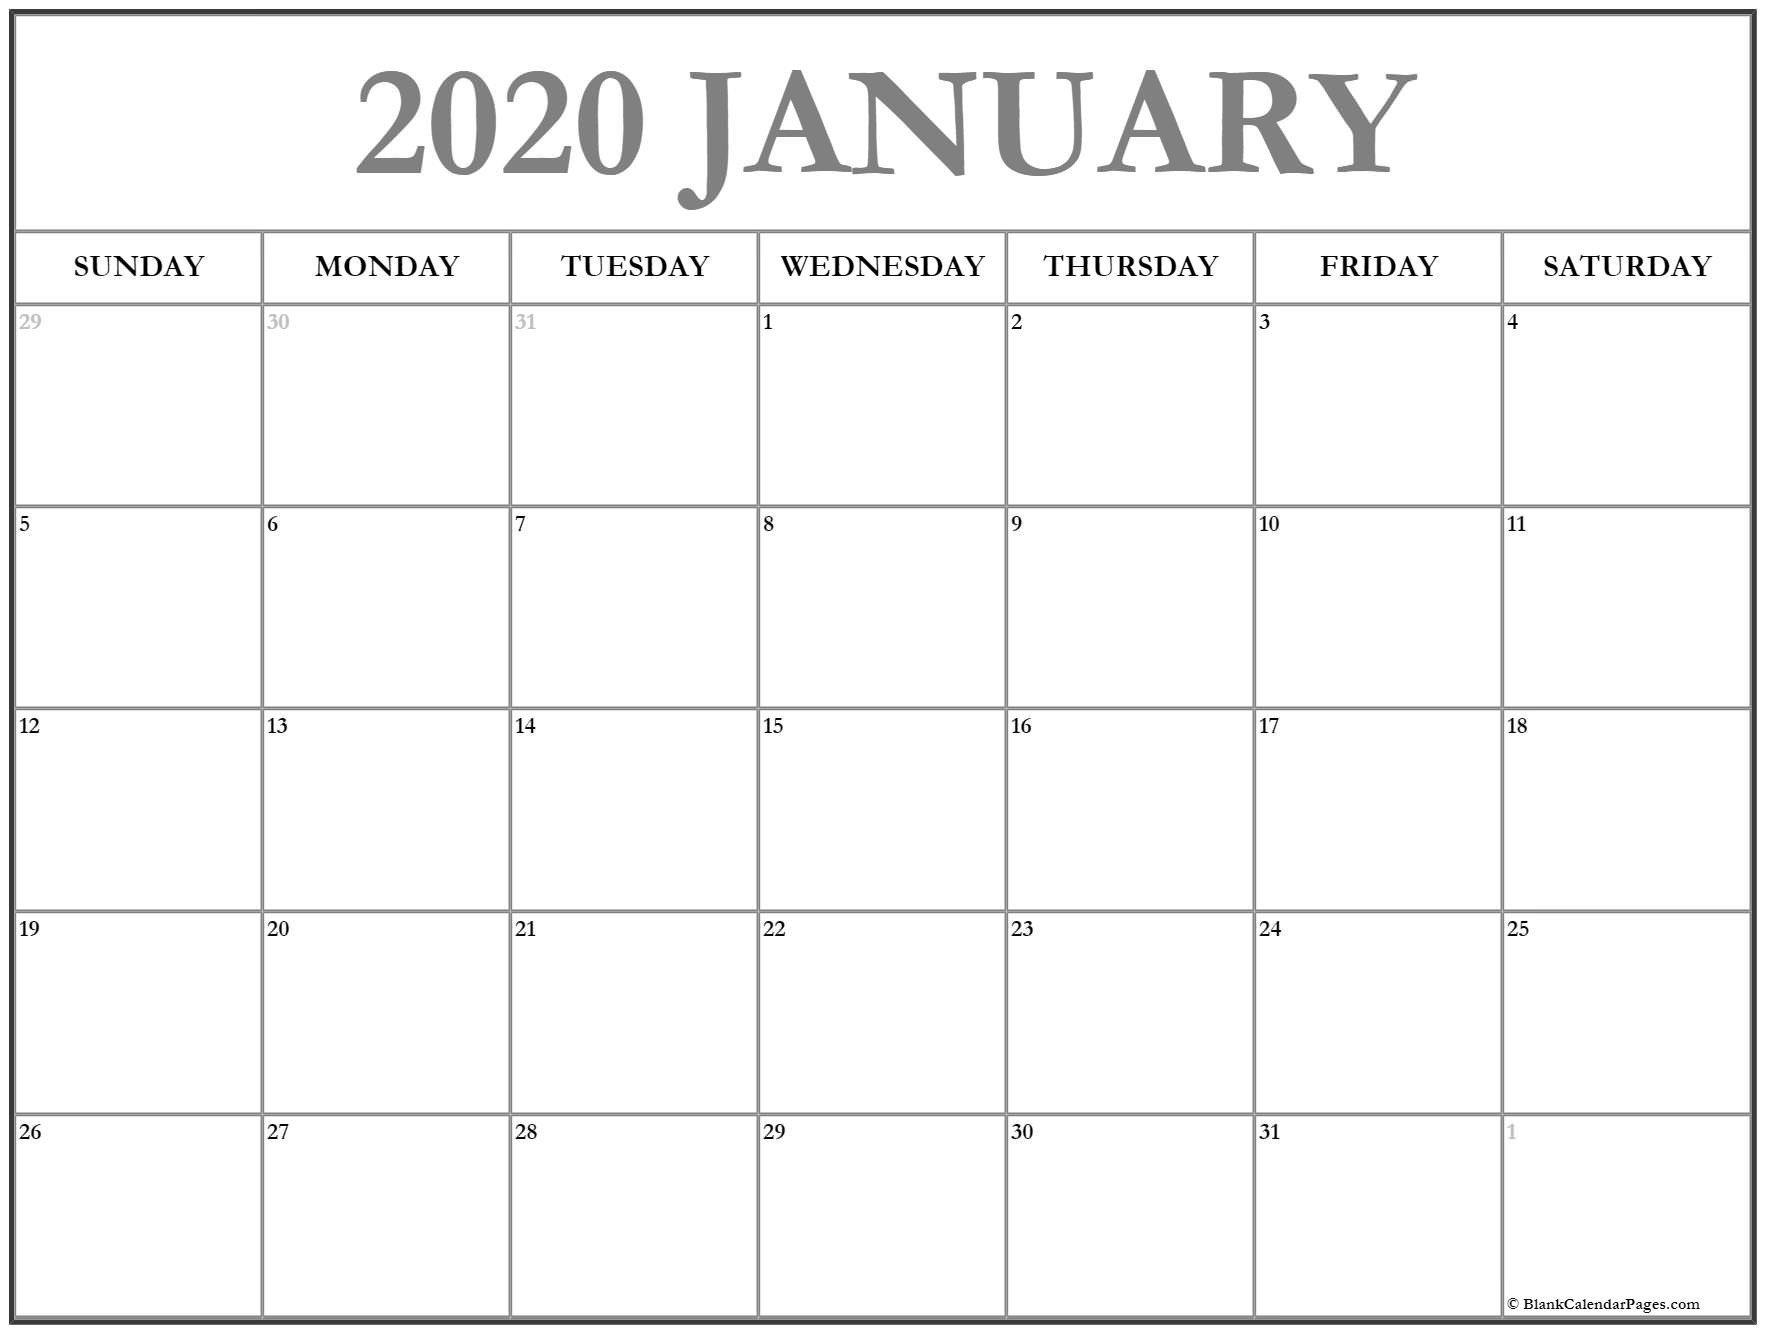 2020 Free Monthly Printable Calendar Monday Thru Friday Mon - Friday Monthly Calendar Template